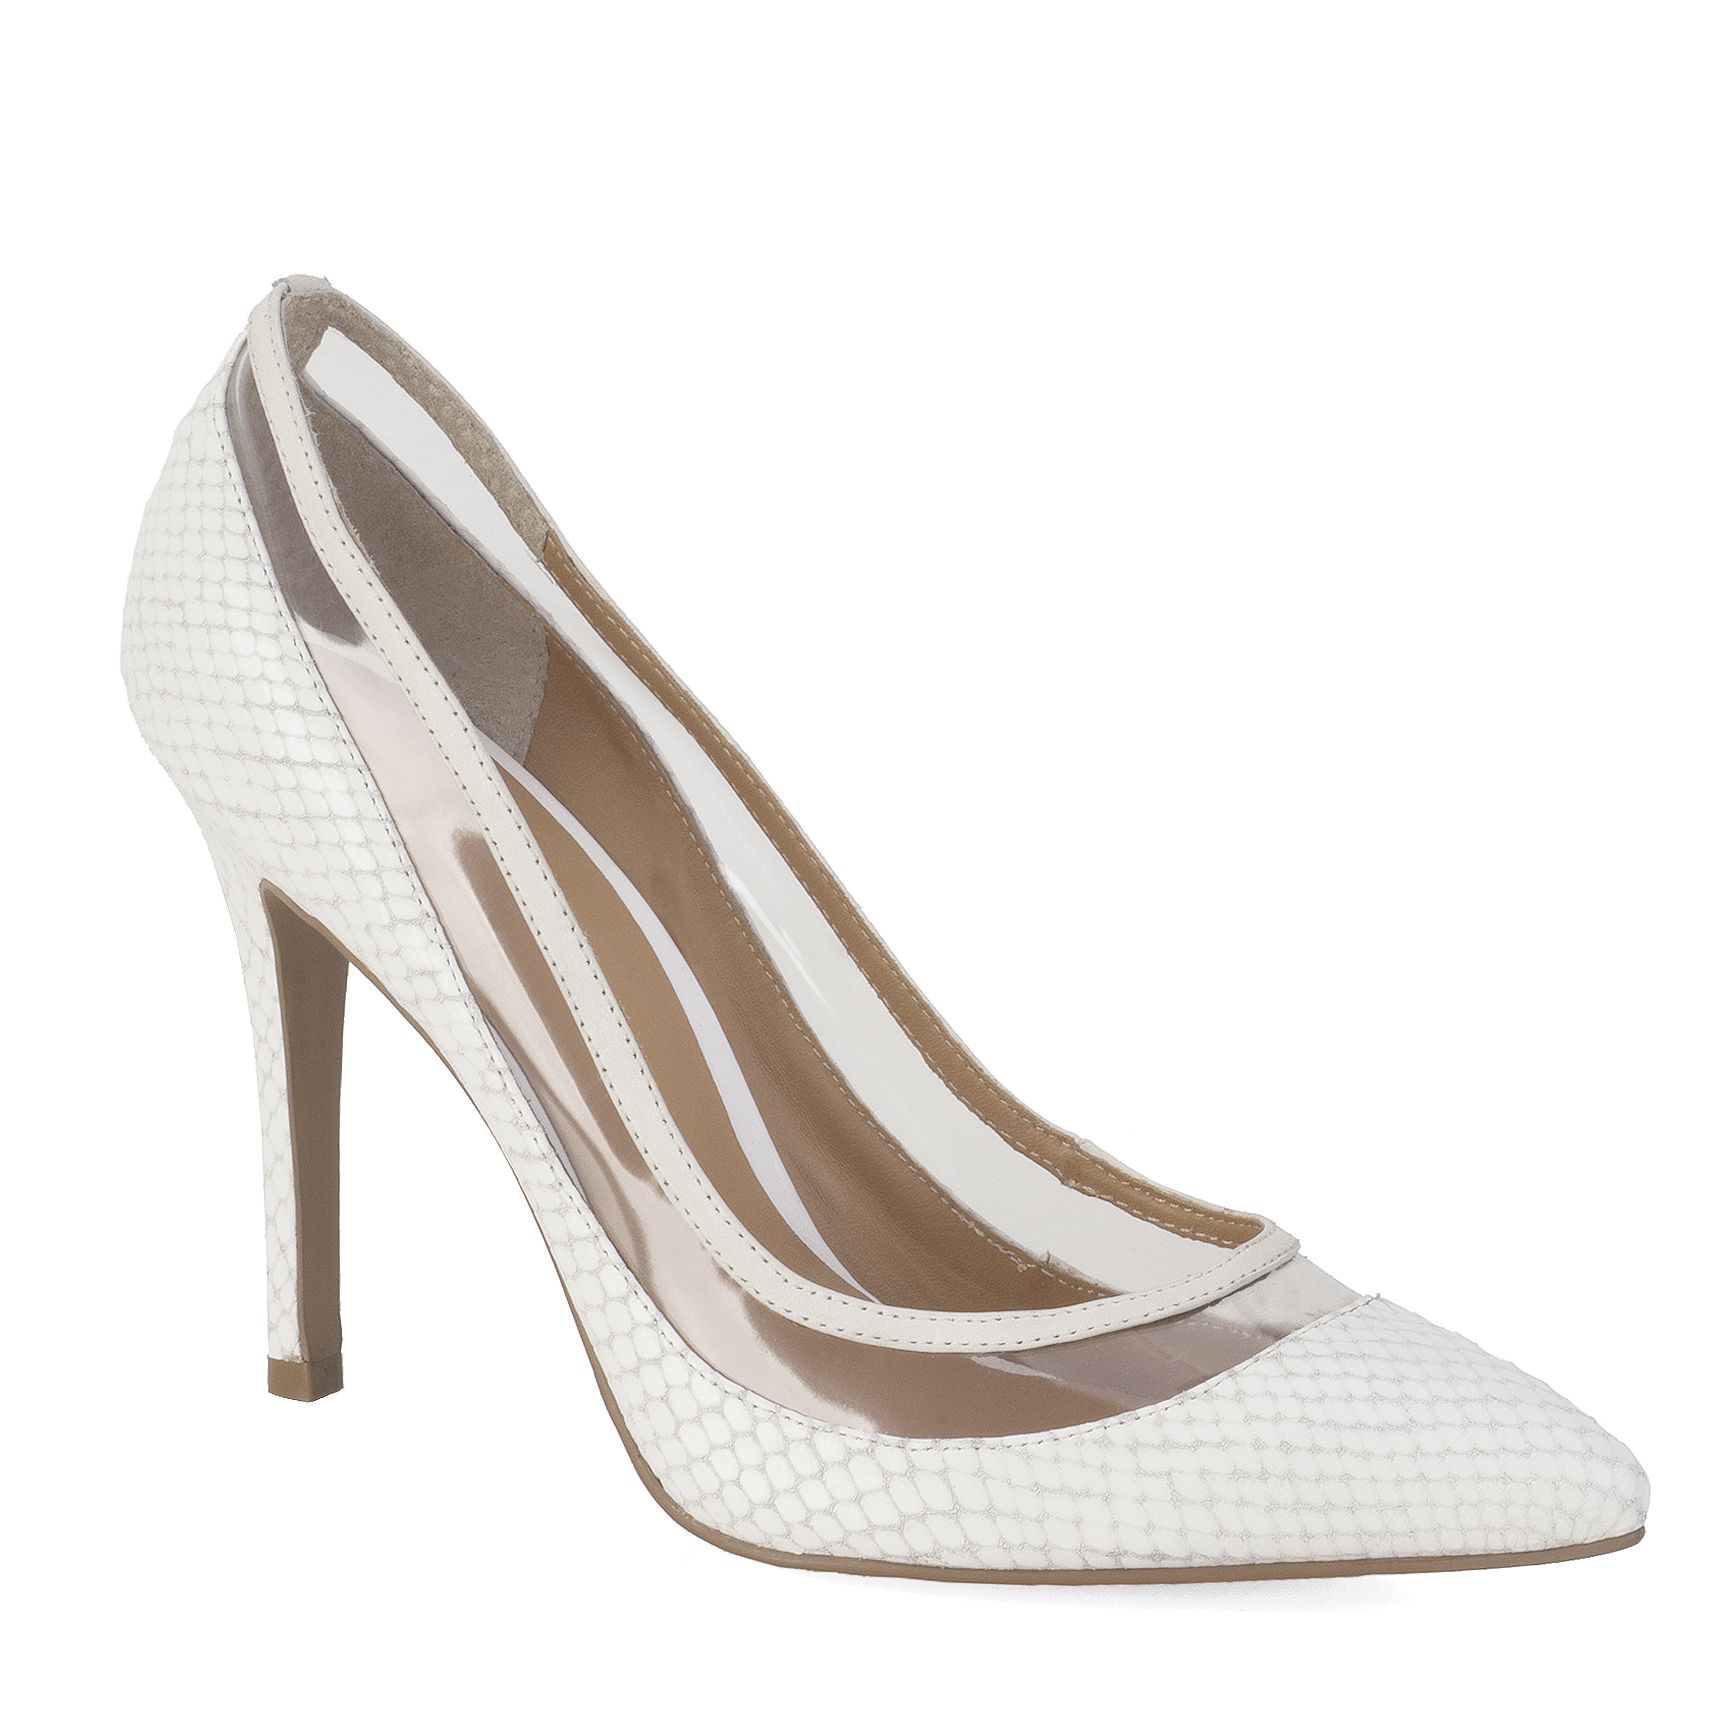 Www Kazar Com Shoes Buty Boots Kazar Fashion Heels Szpilki Shoes Wedding Shoe Fashion